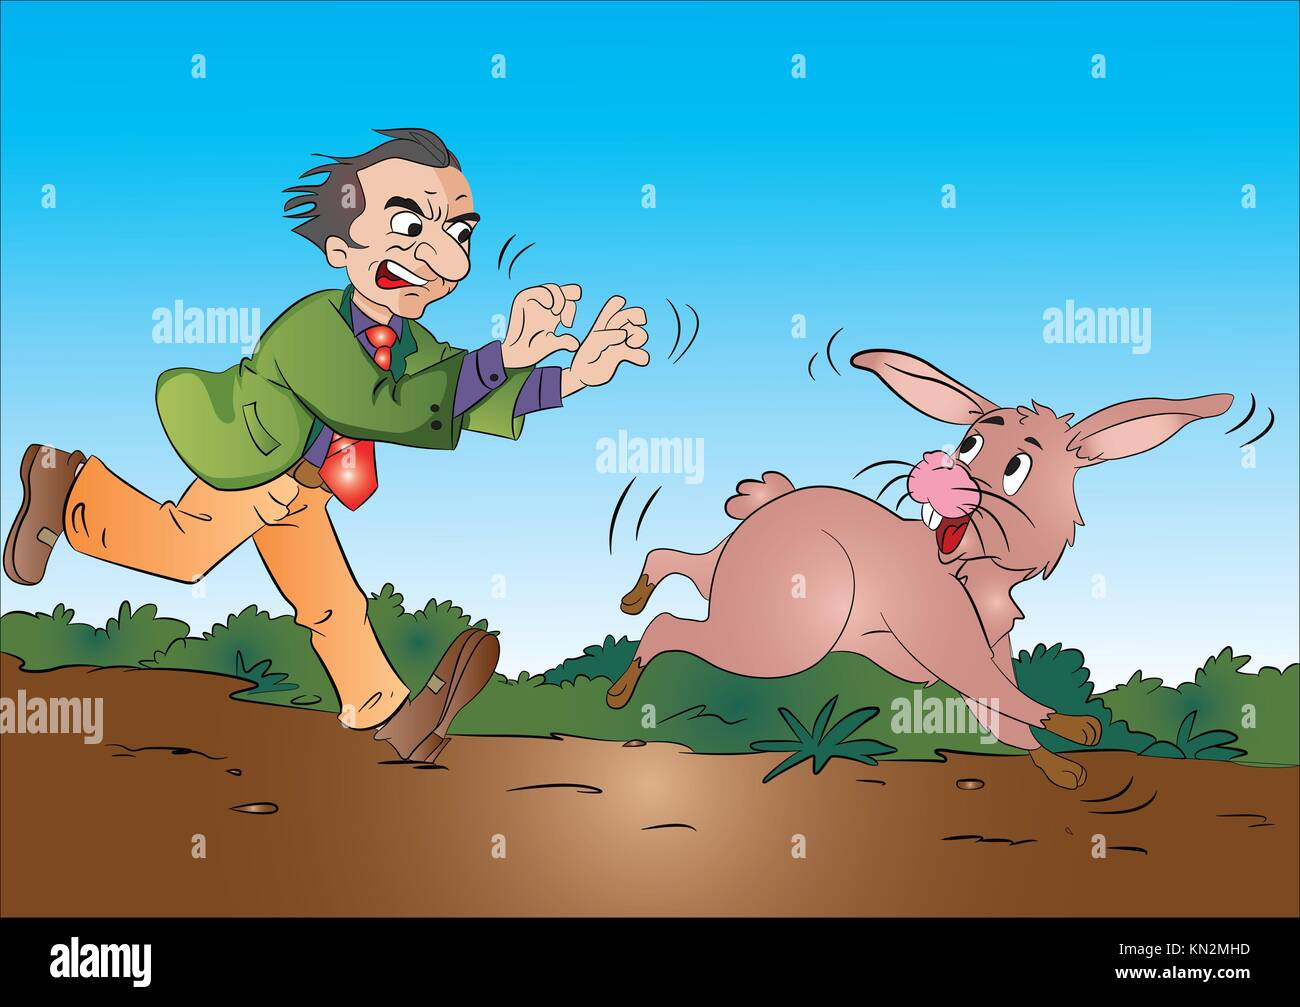 Man Running After a Rabbit, vector illustration Stock Photo